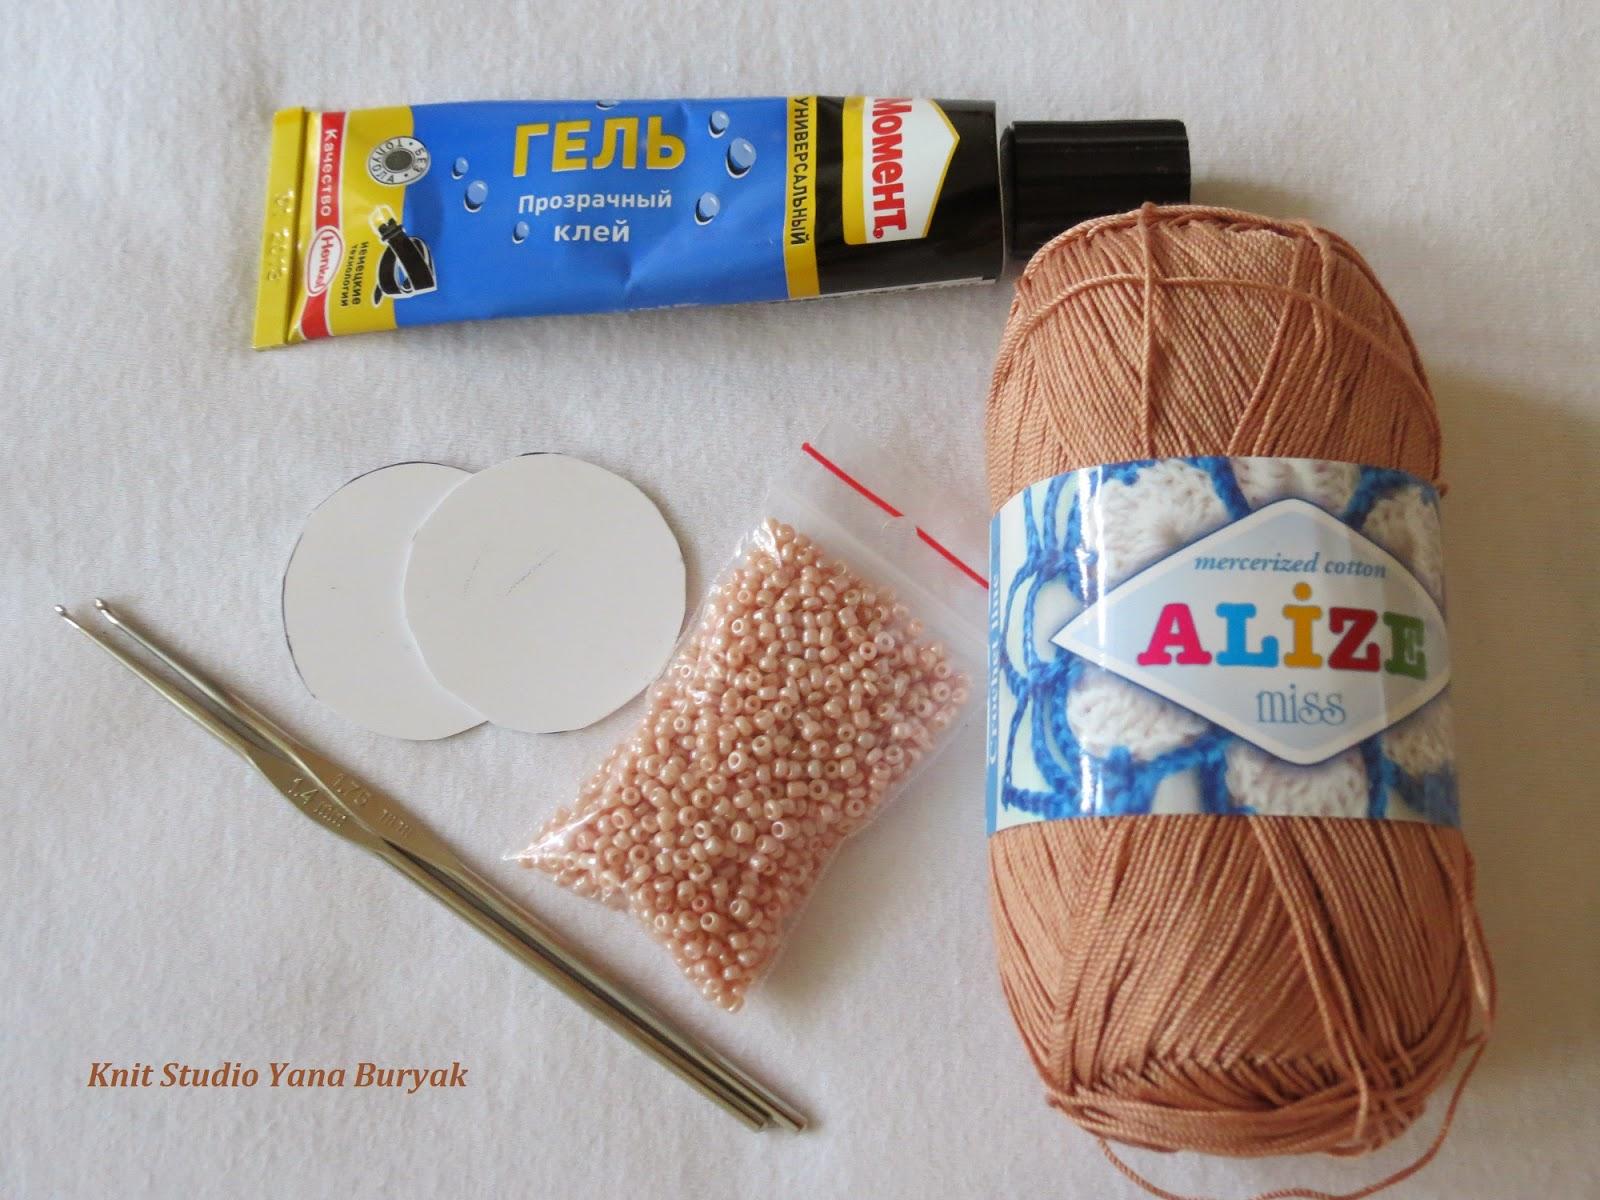 Knit Studio Yana Buryak мастер класс по вязанию с бисером